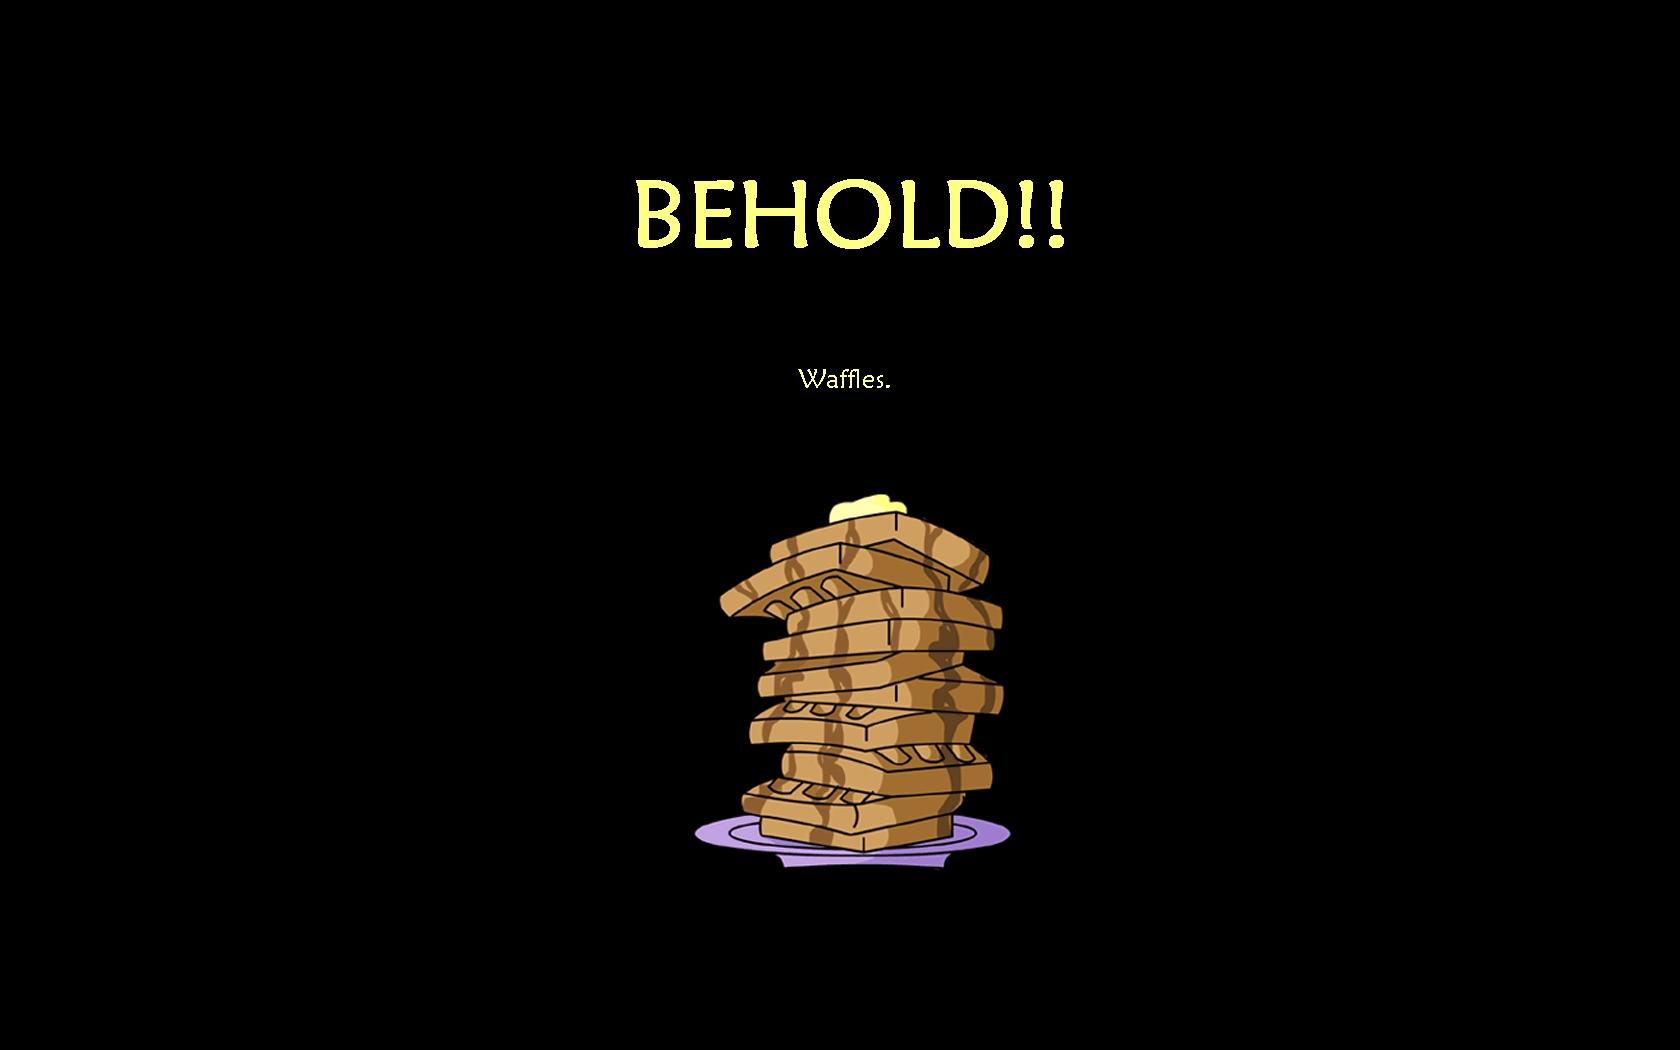 Funny Waffle Image Hd